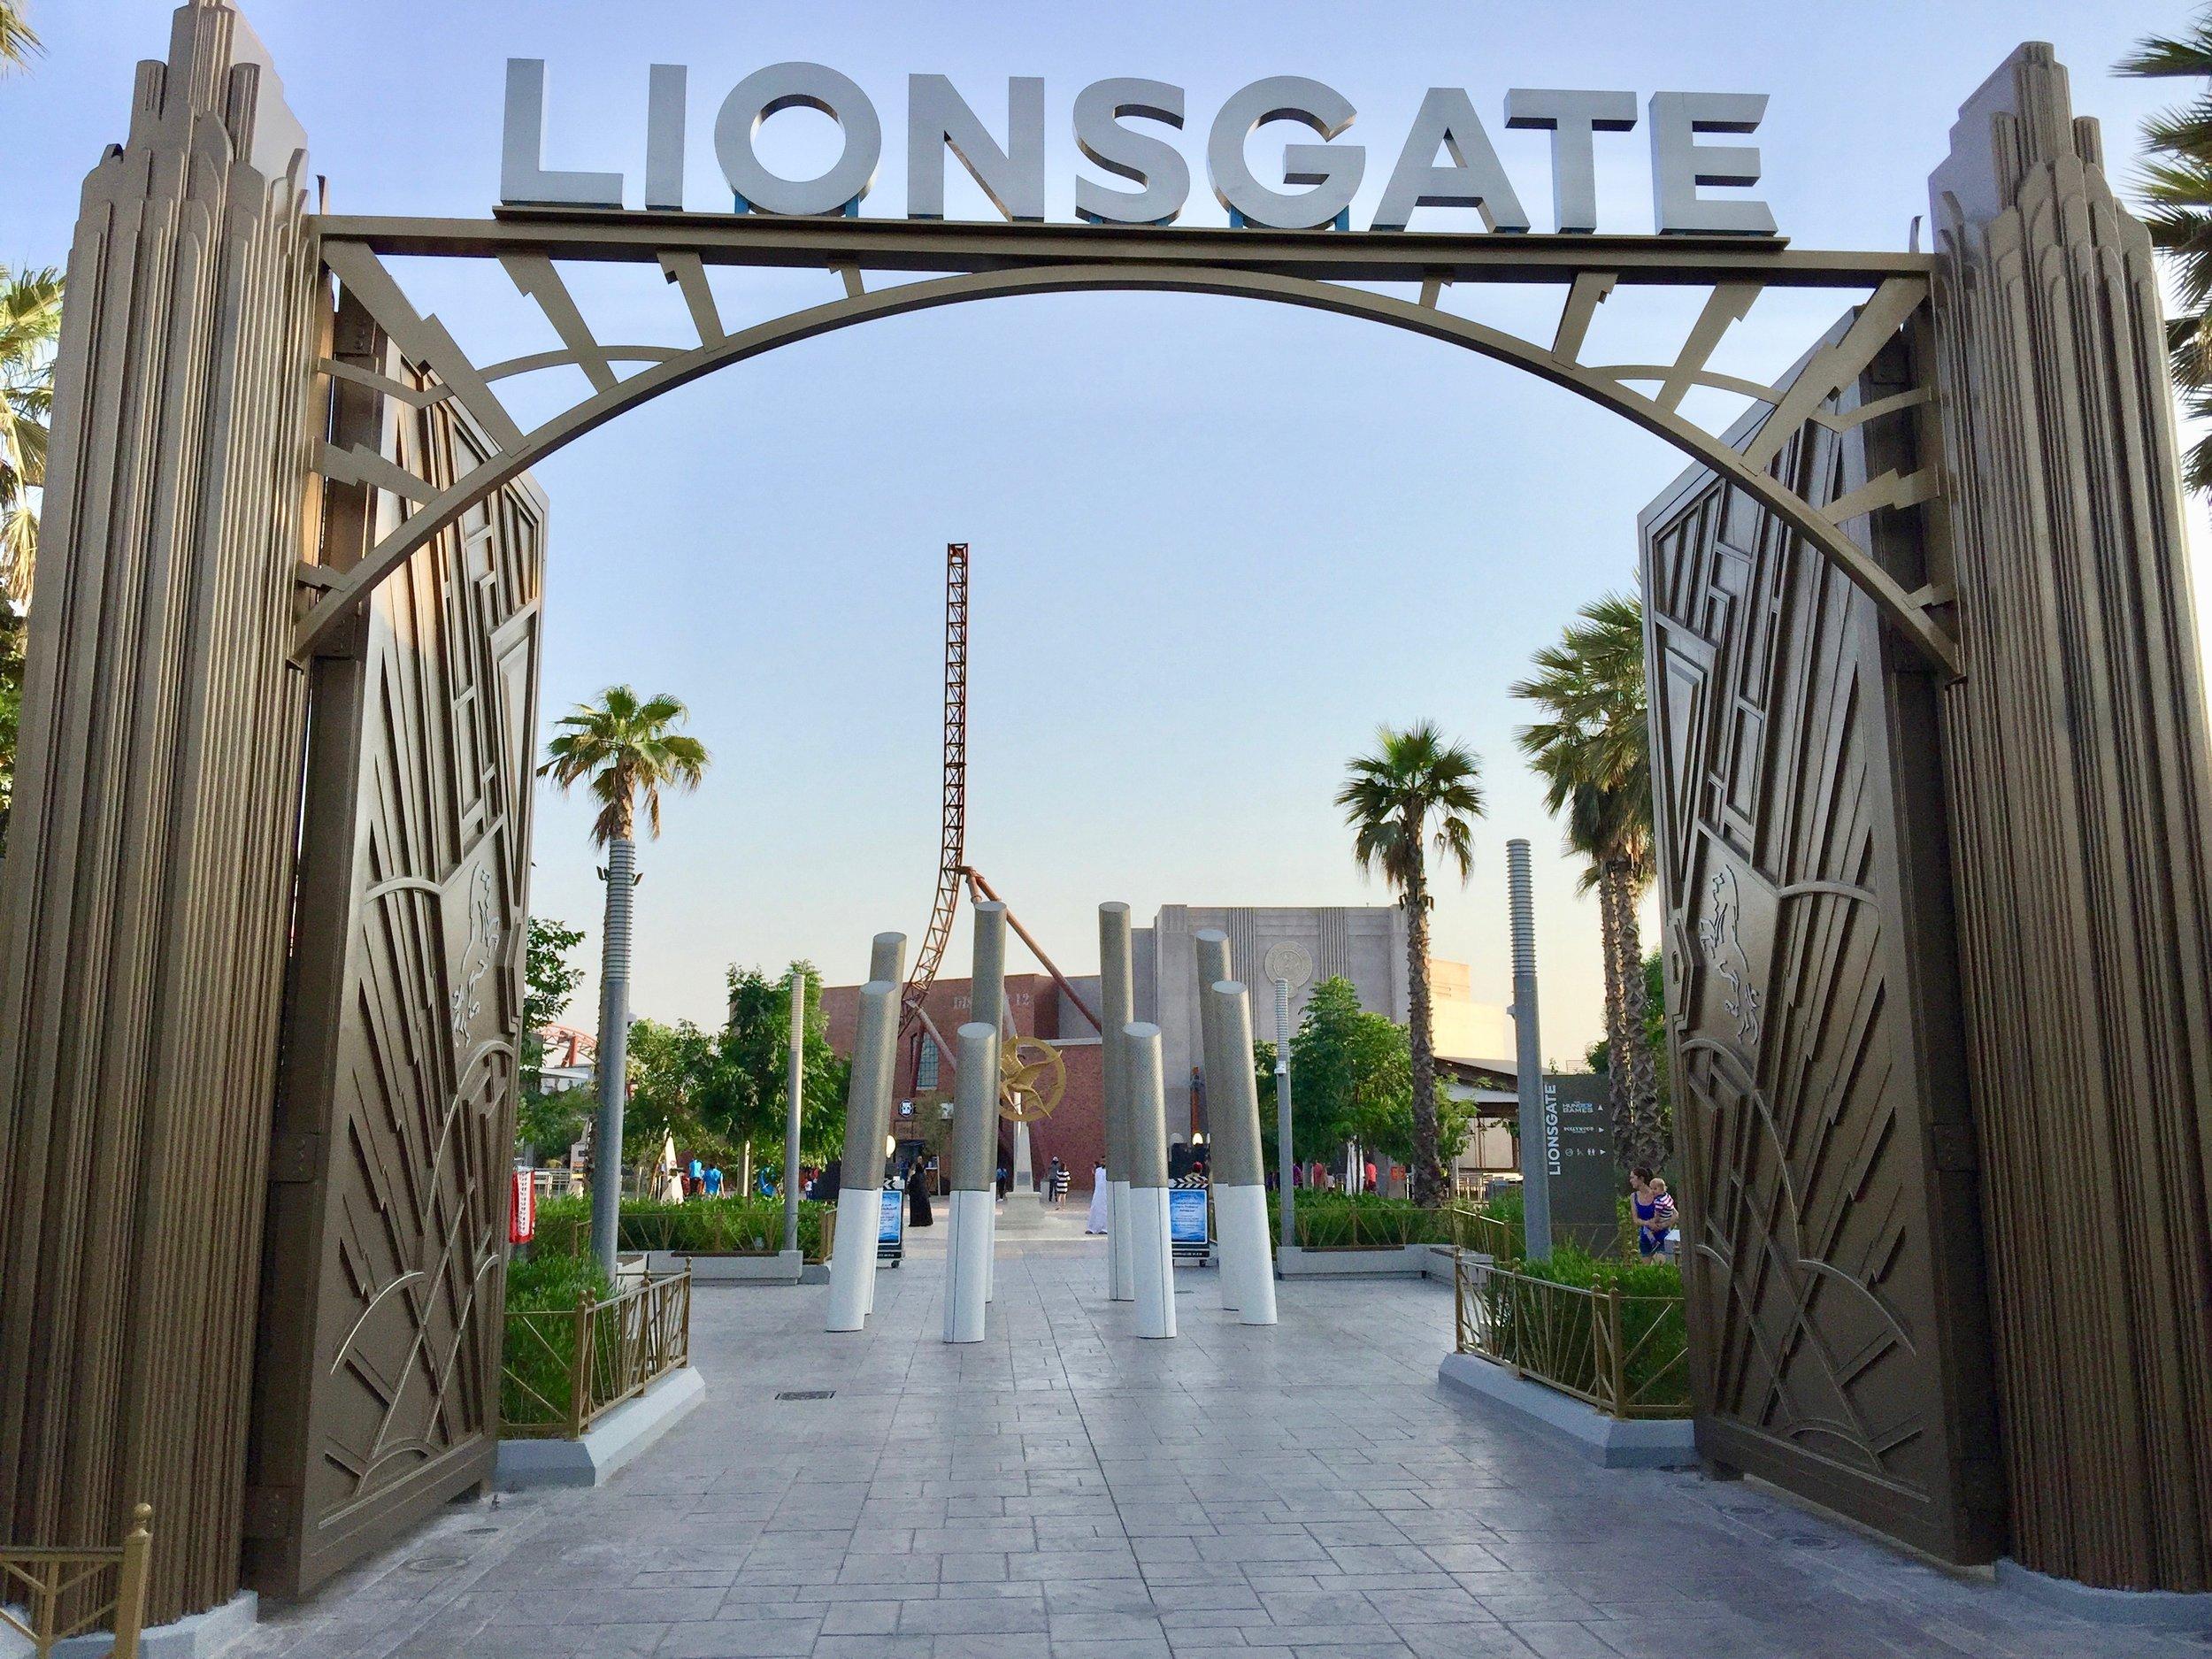 img_0989motiongate-theme-park-dubai-the-hunger-games-lionsgate-zonne.jpg